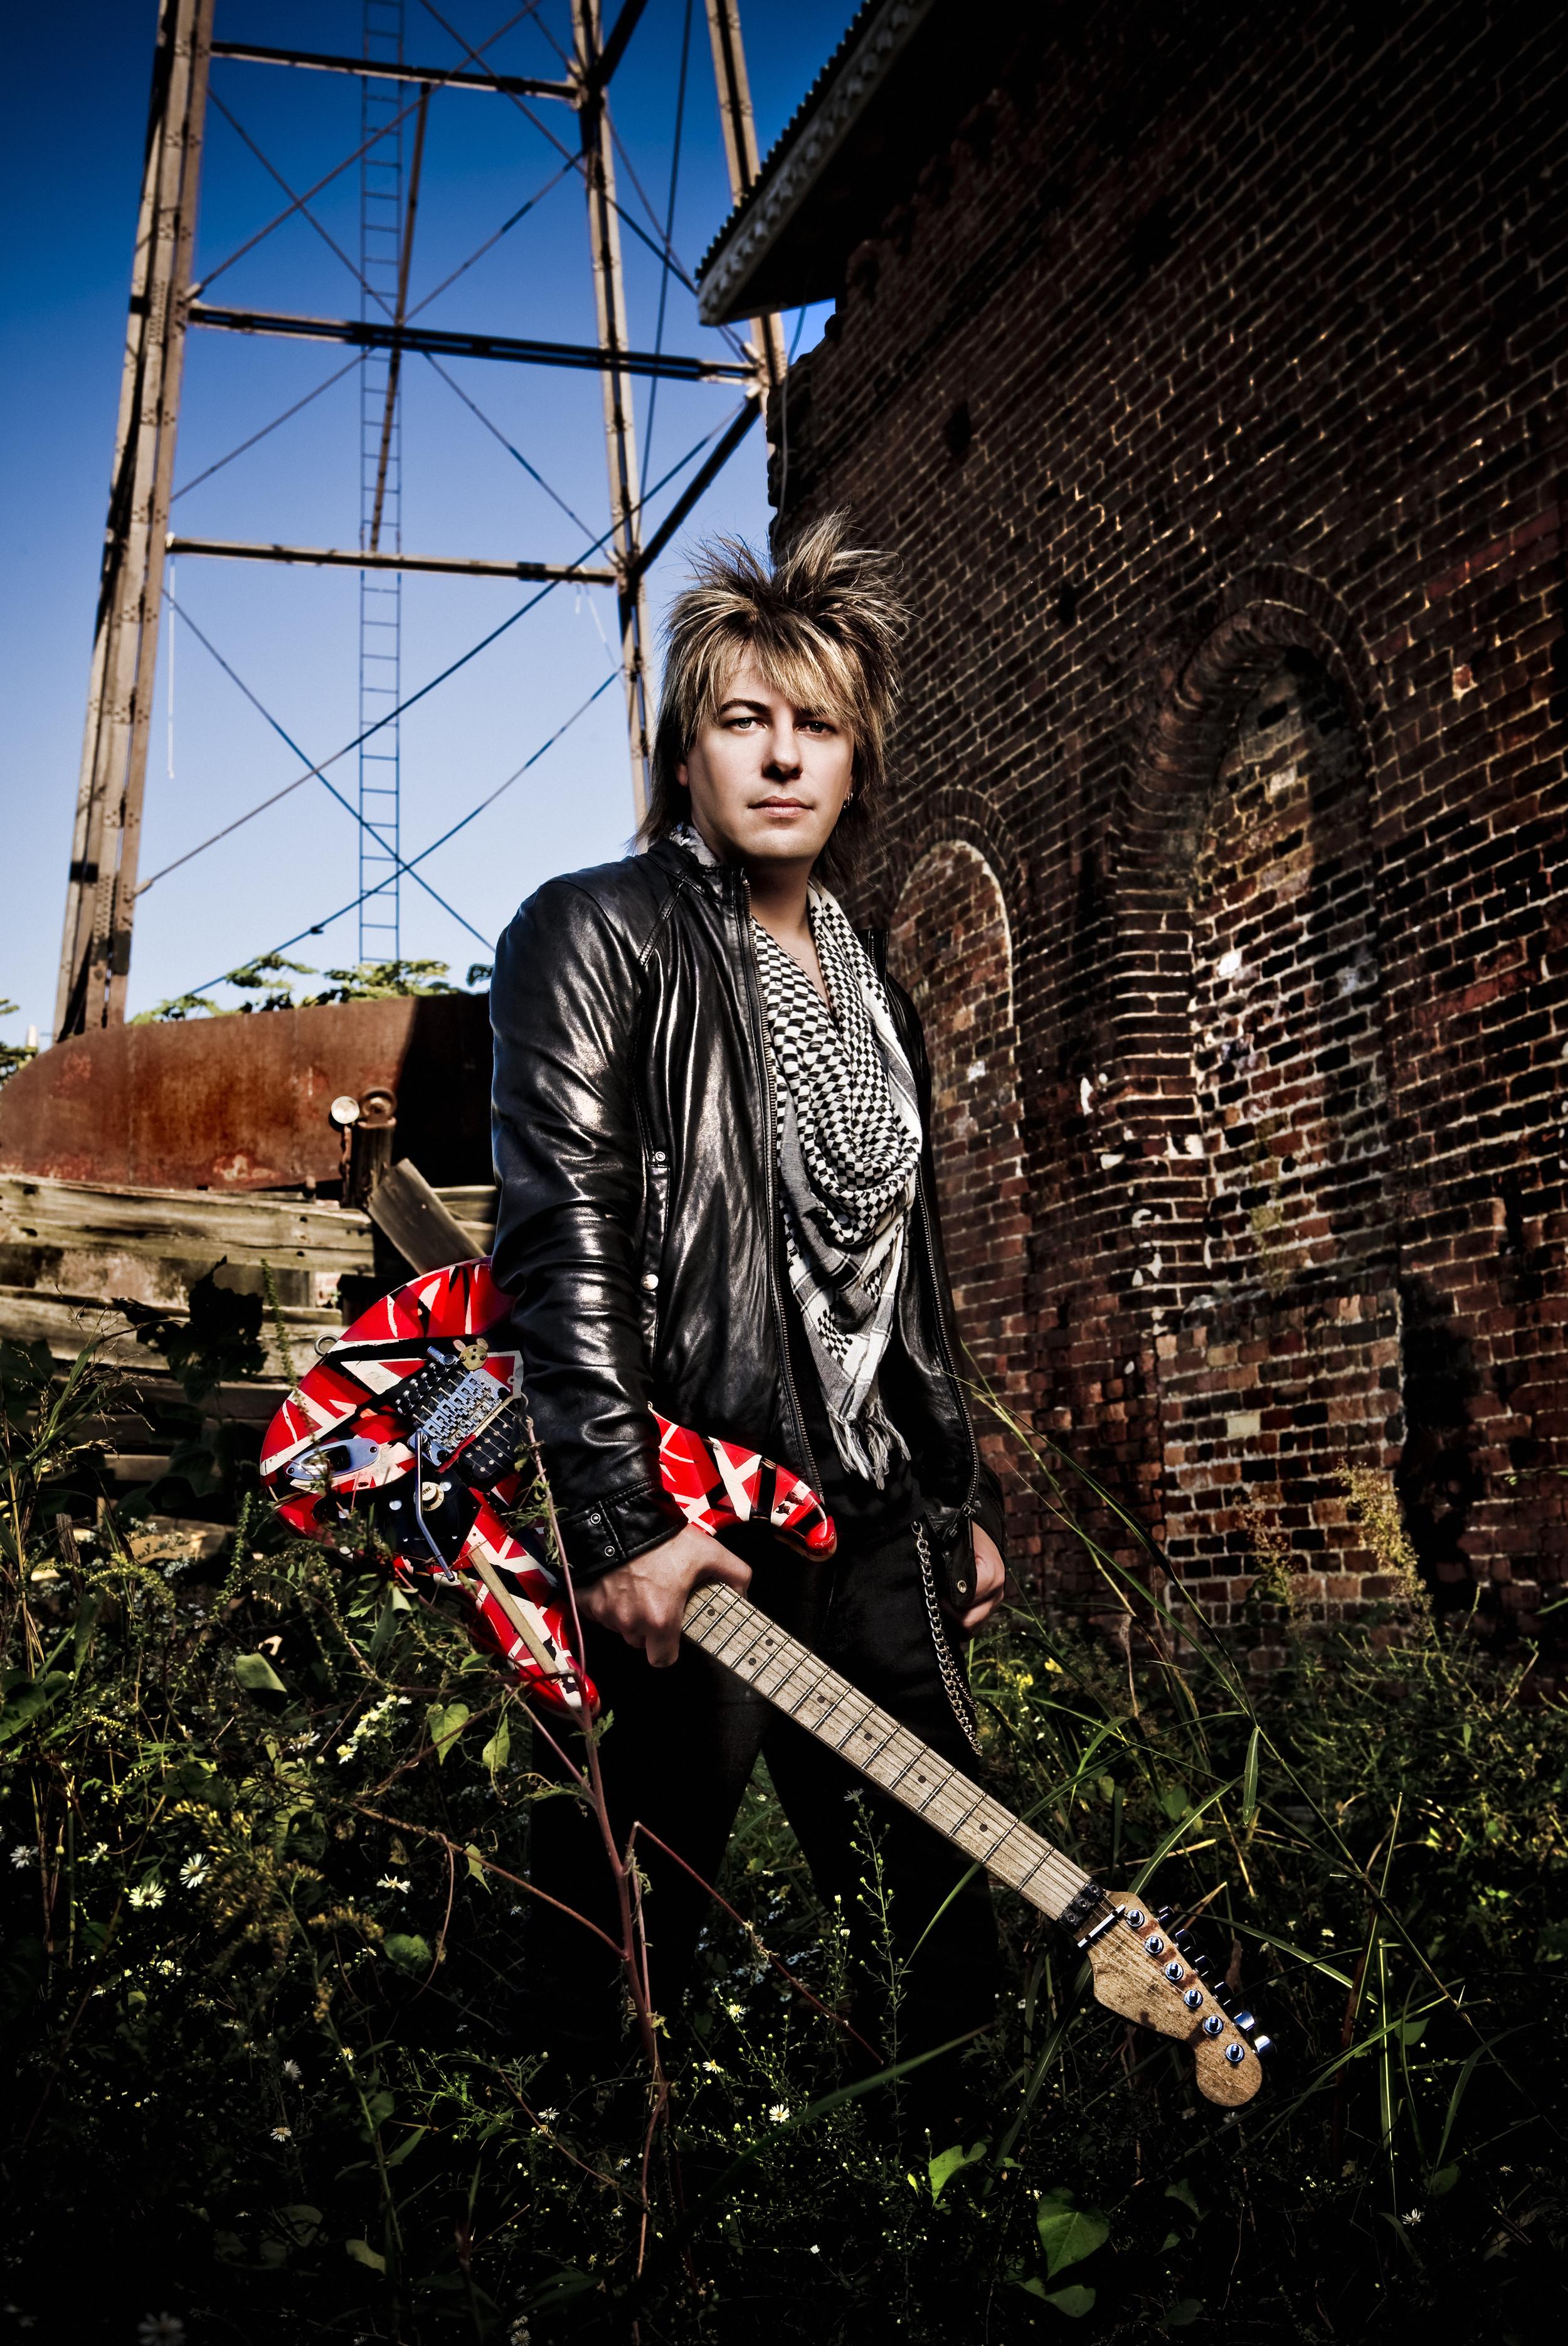 Paul Sidoti 120 Copyright 2010 Ash Newell Photography.jpg